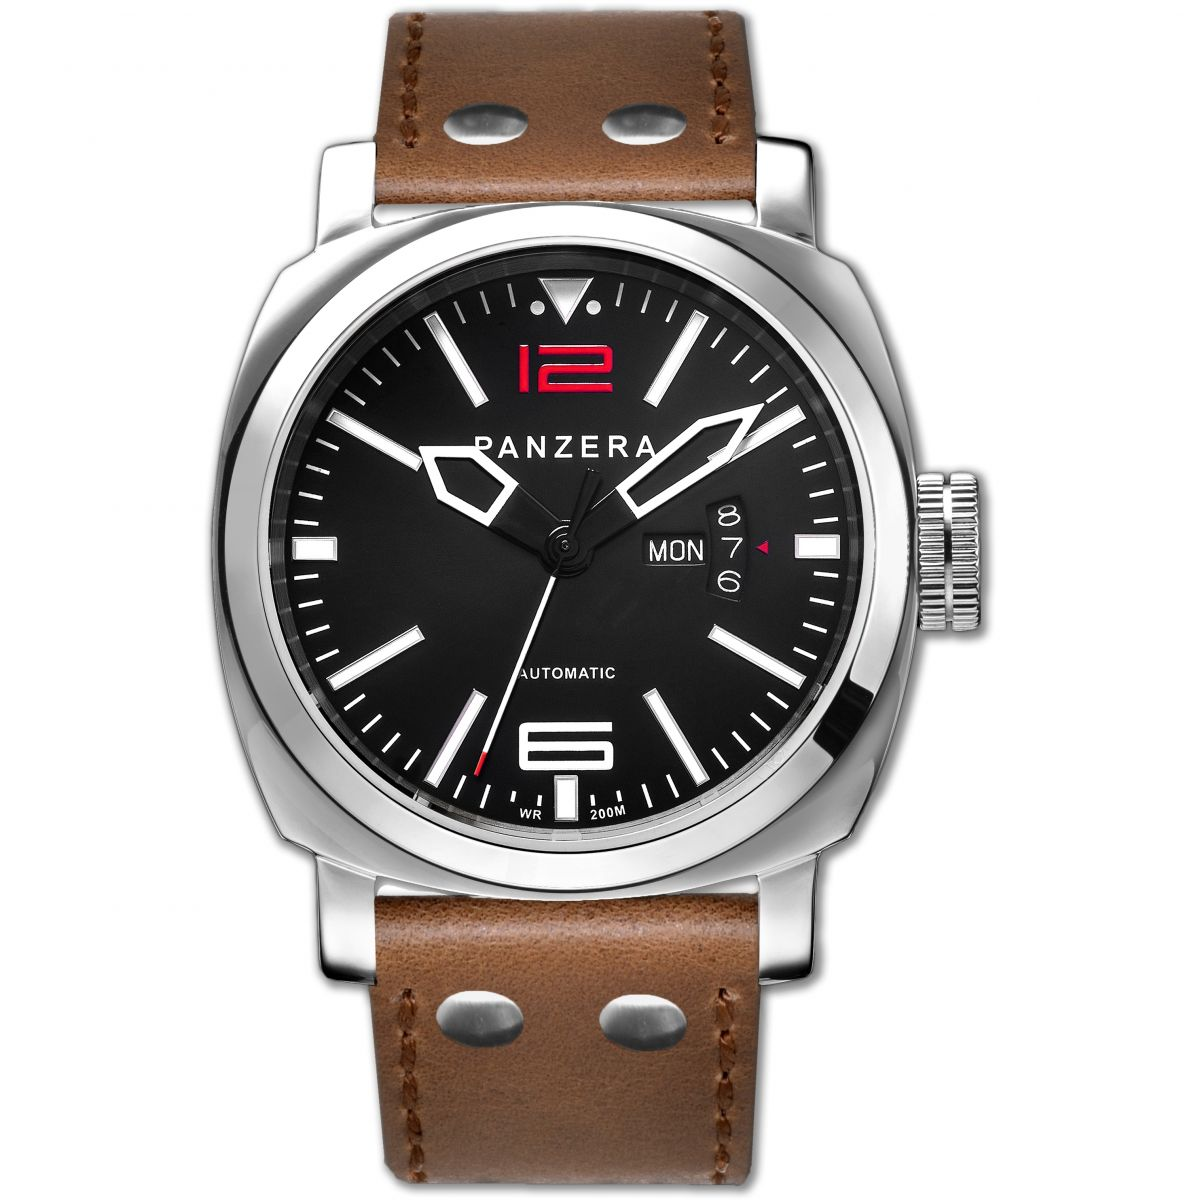 Gents panzera aquamarine atlantic aspire watch a45 01b for Aqua marine watches